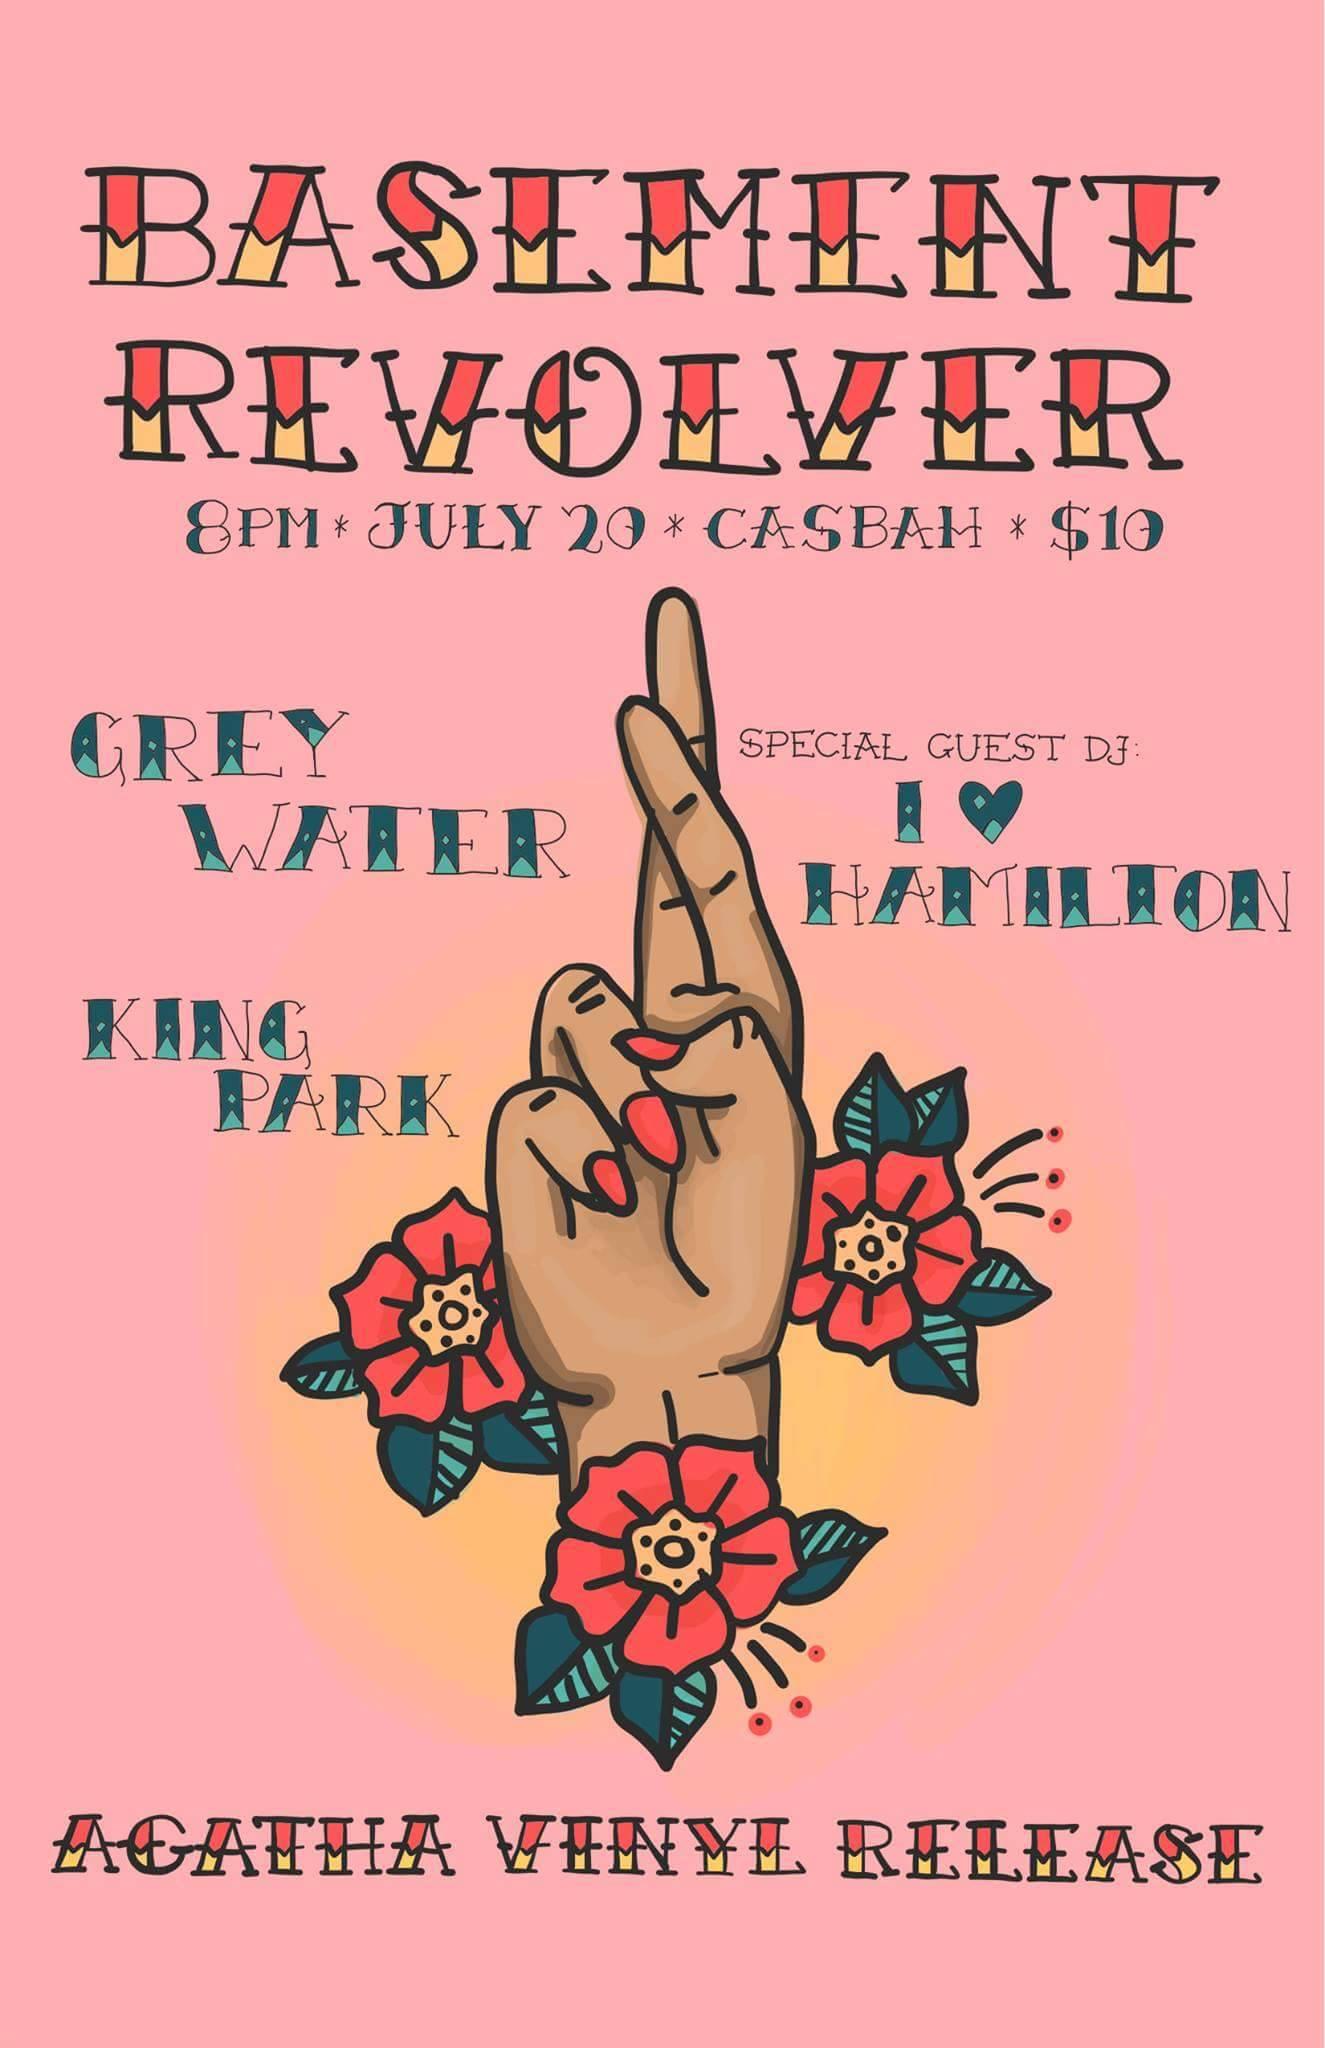 Basement Revolver EP Release show